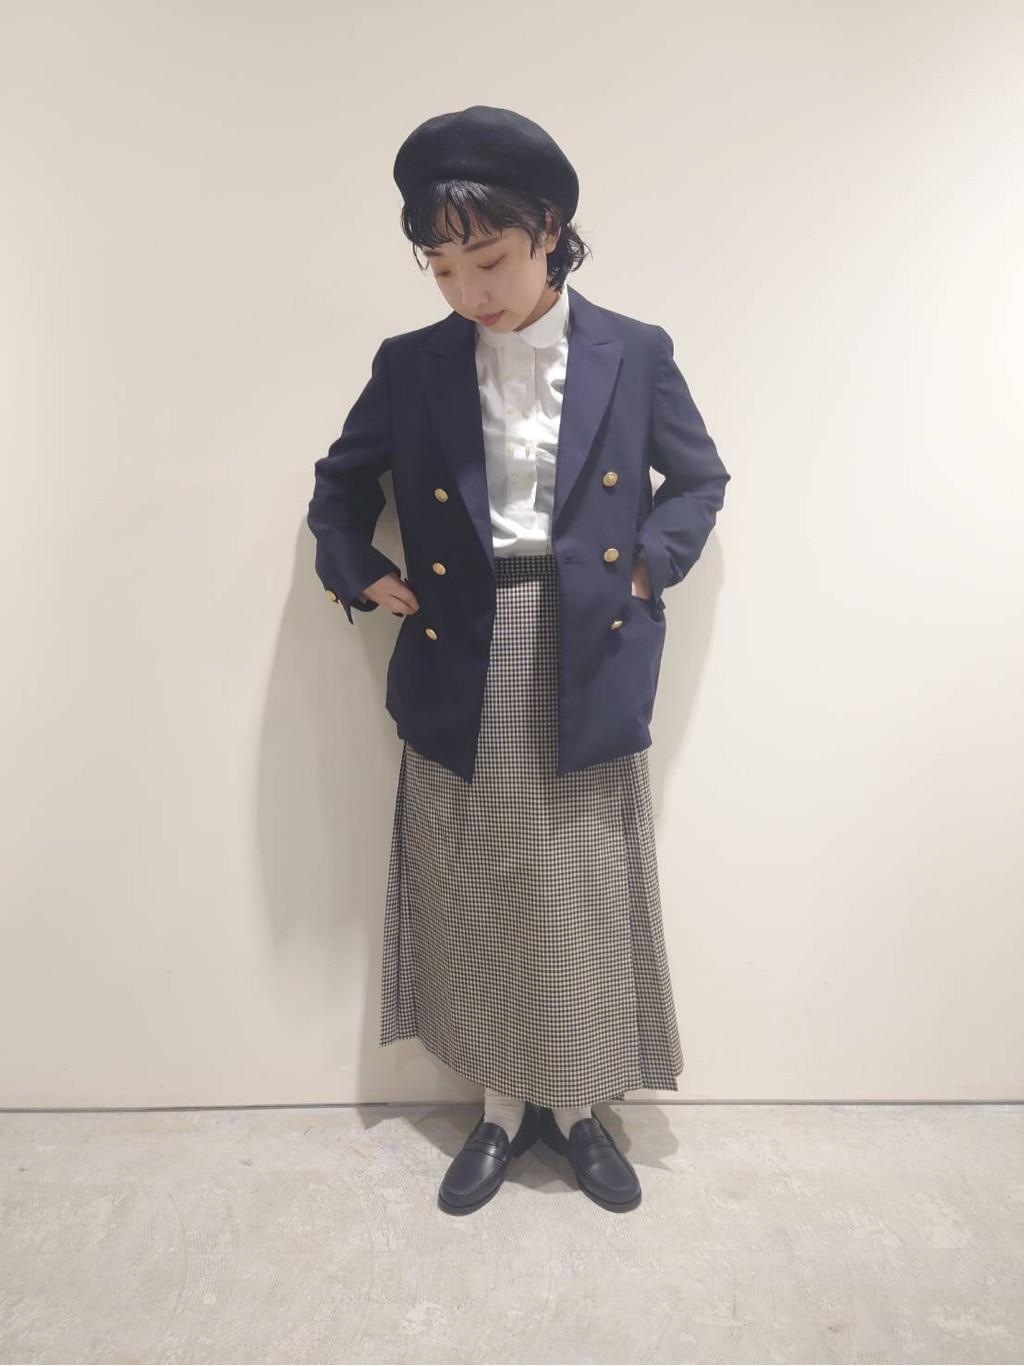 - CHILD WOMAN CHILD WOMAN , PAR ICI ルミネ横浜 身長:157cm 2020.09.23